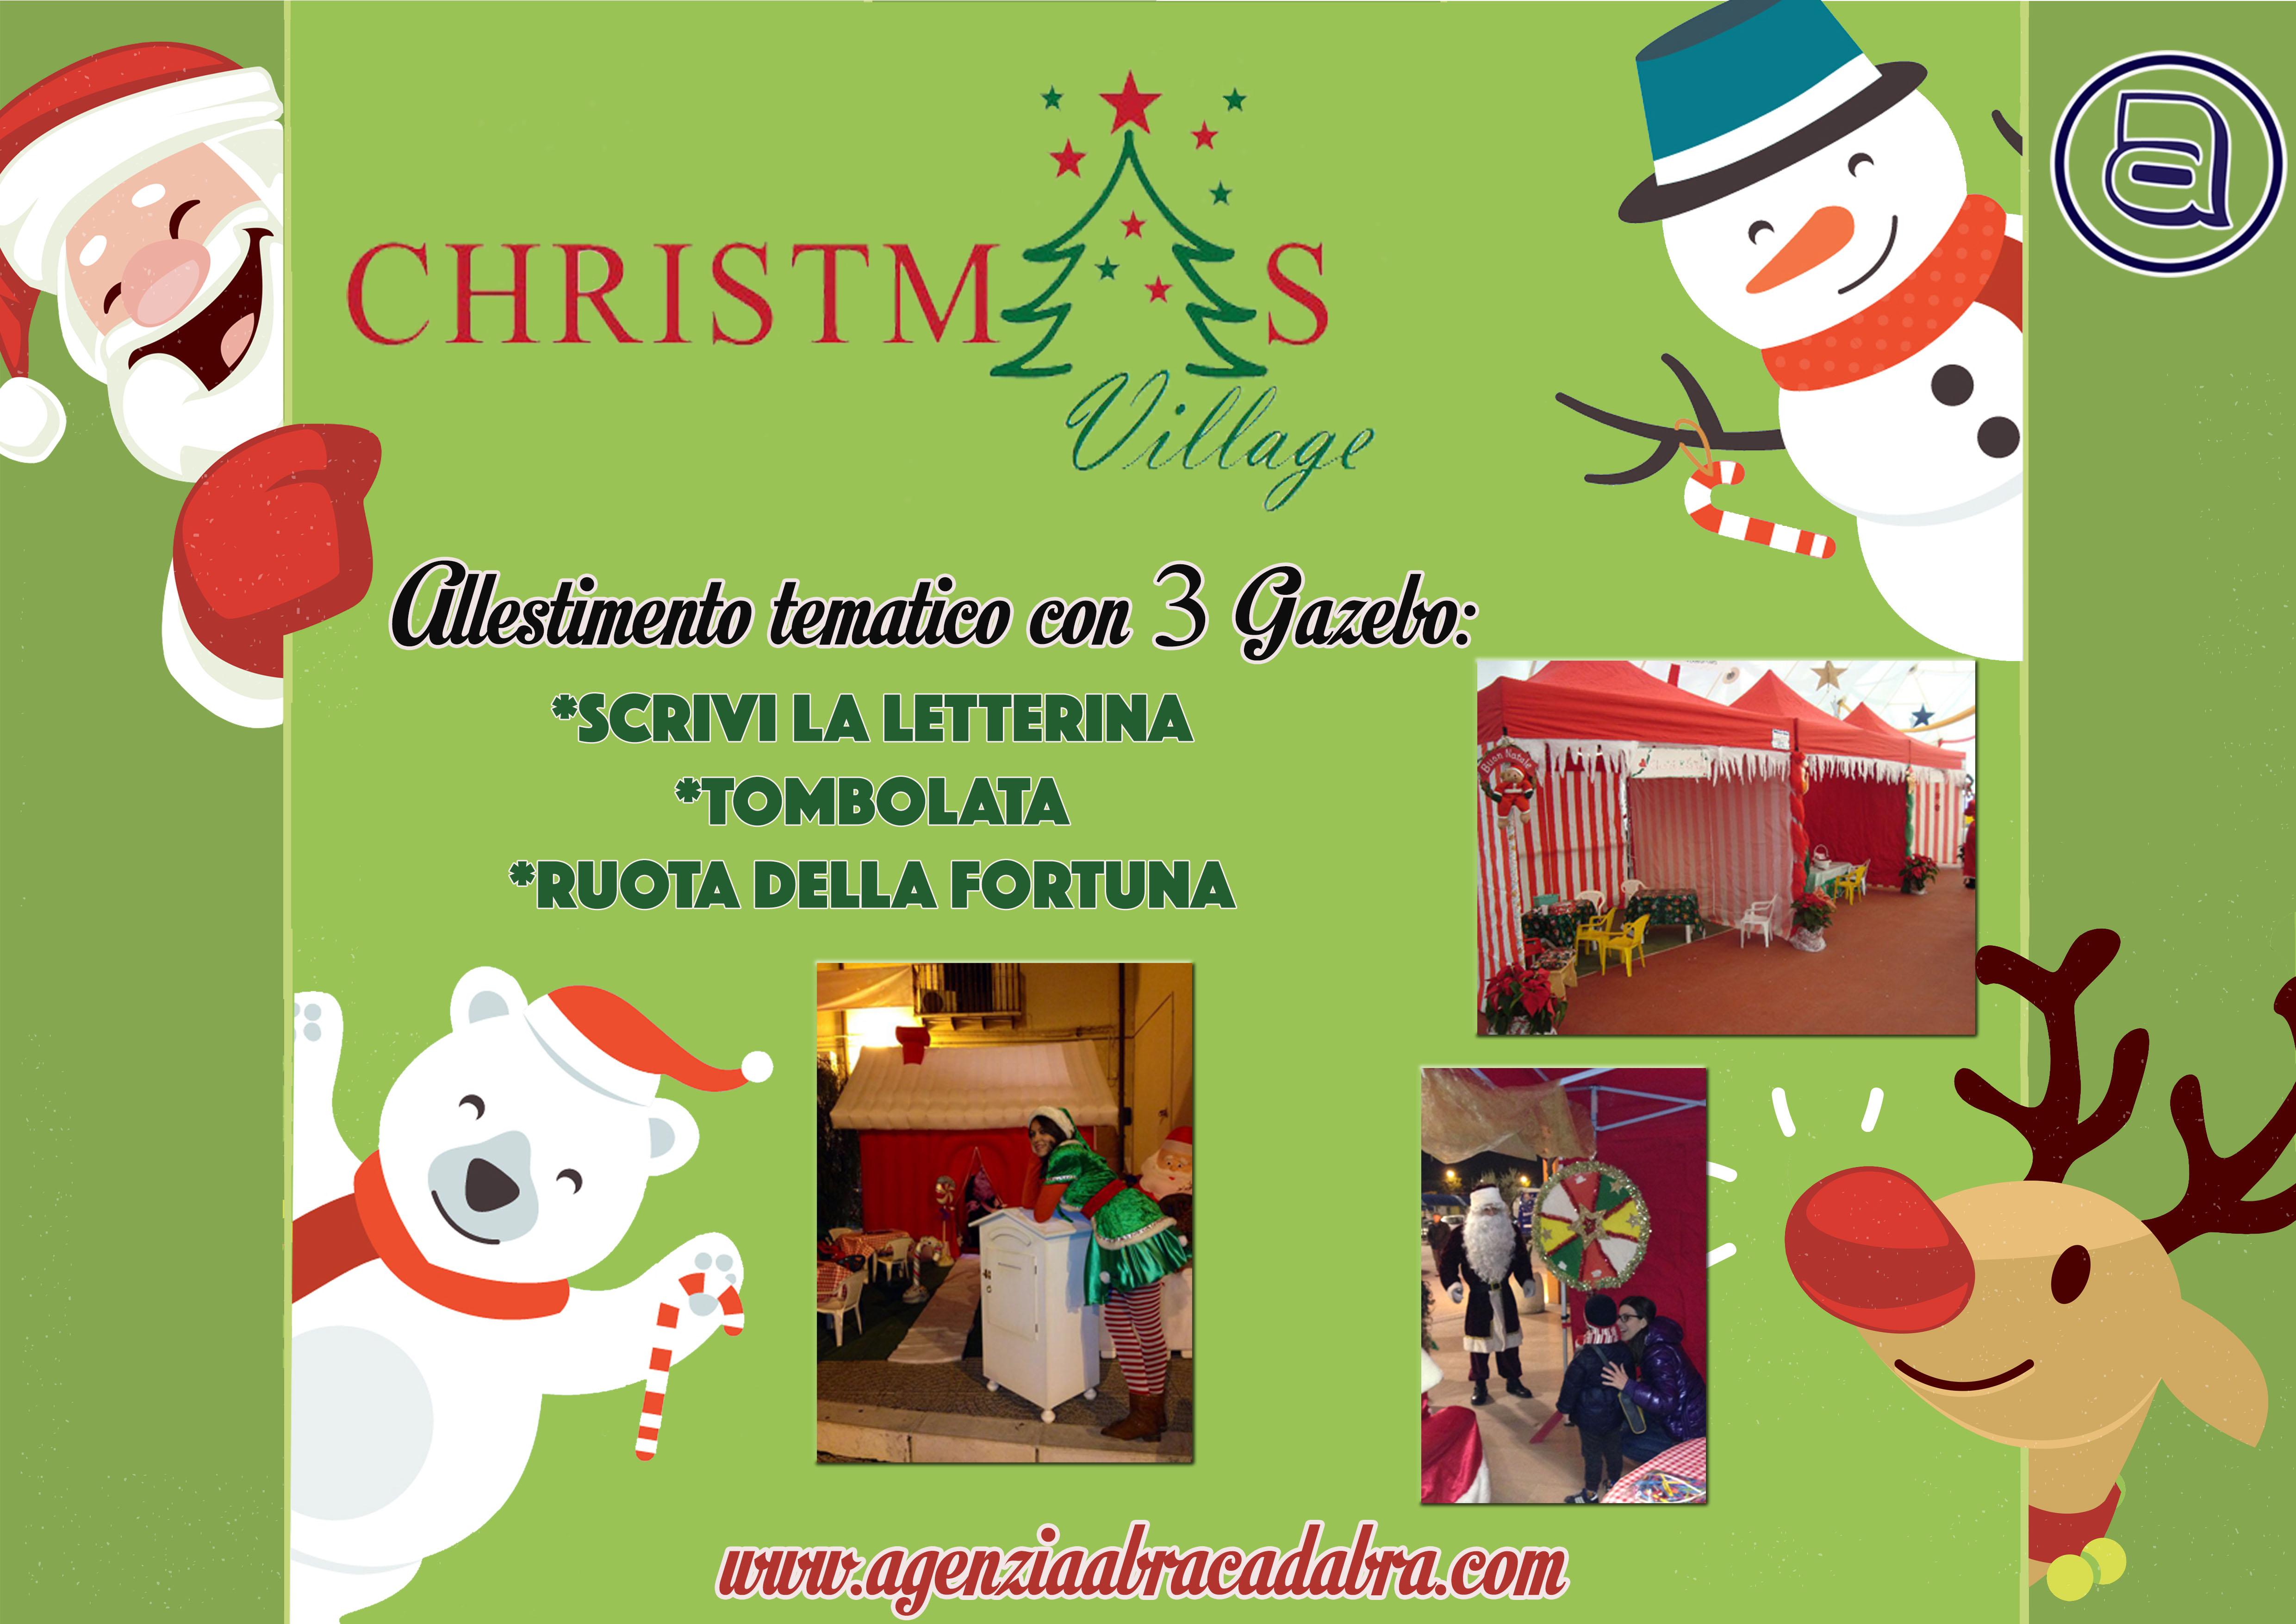 6-christmasvillage